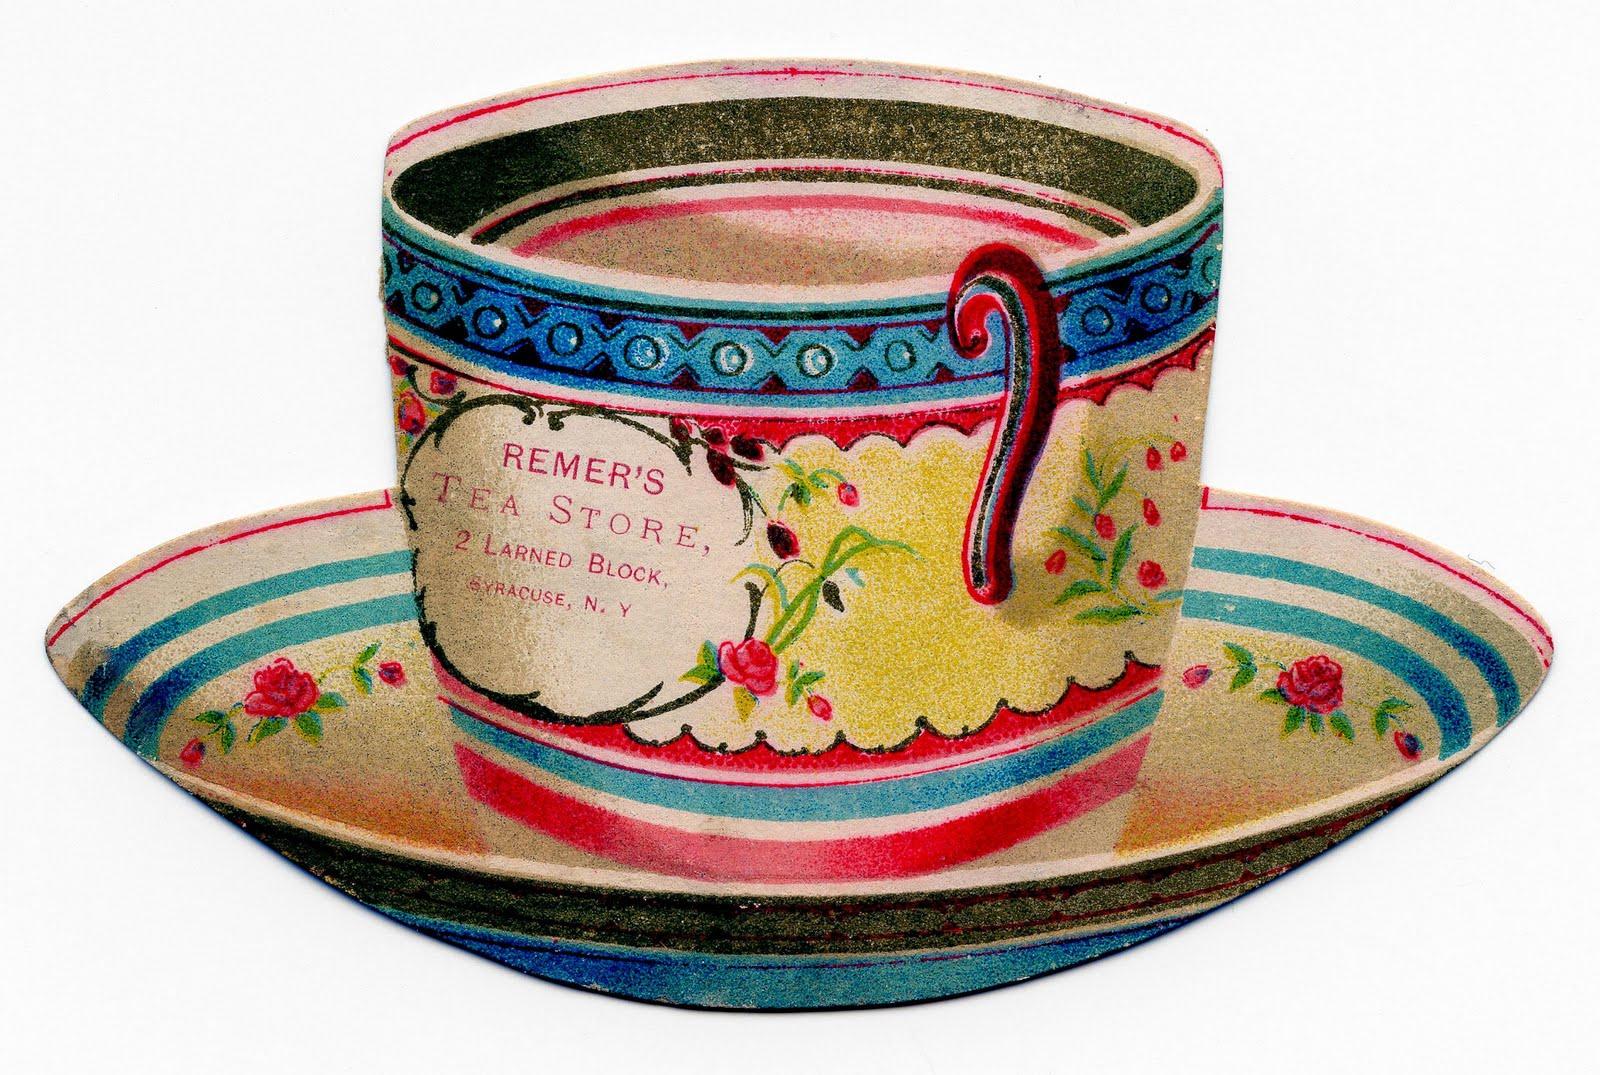 clip Cliparts download clip art. Free teacup clipart